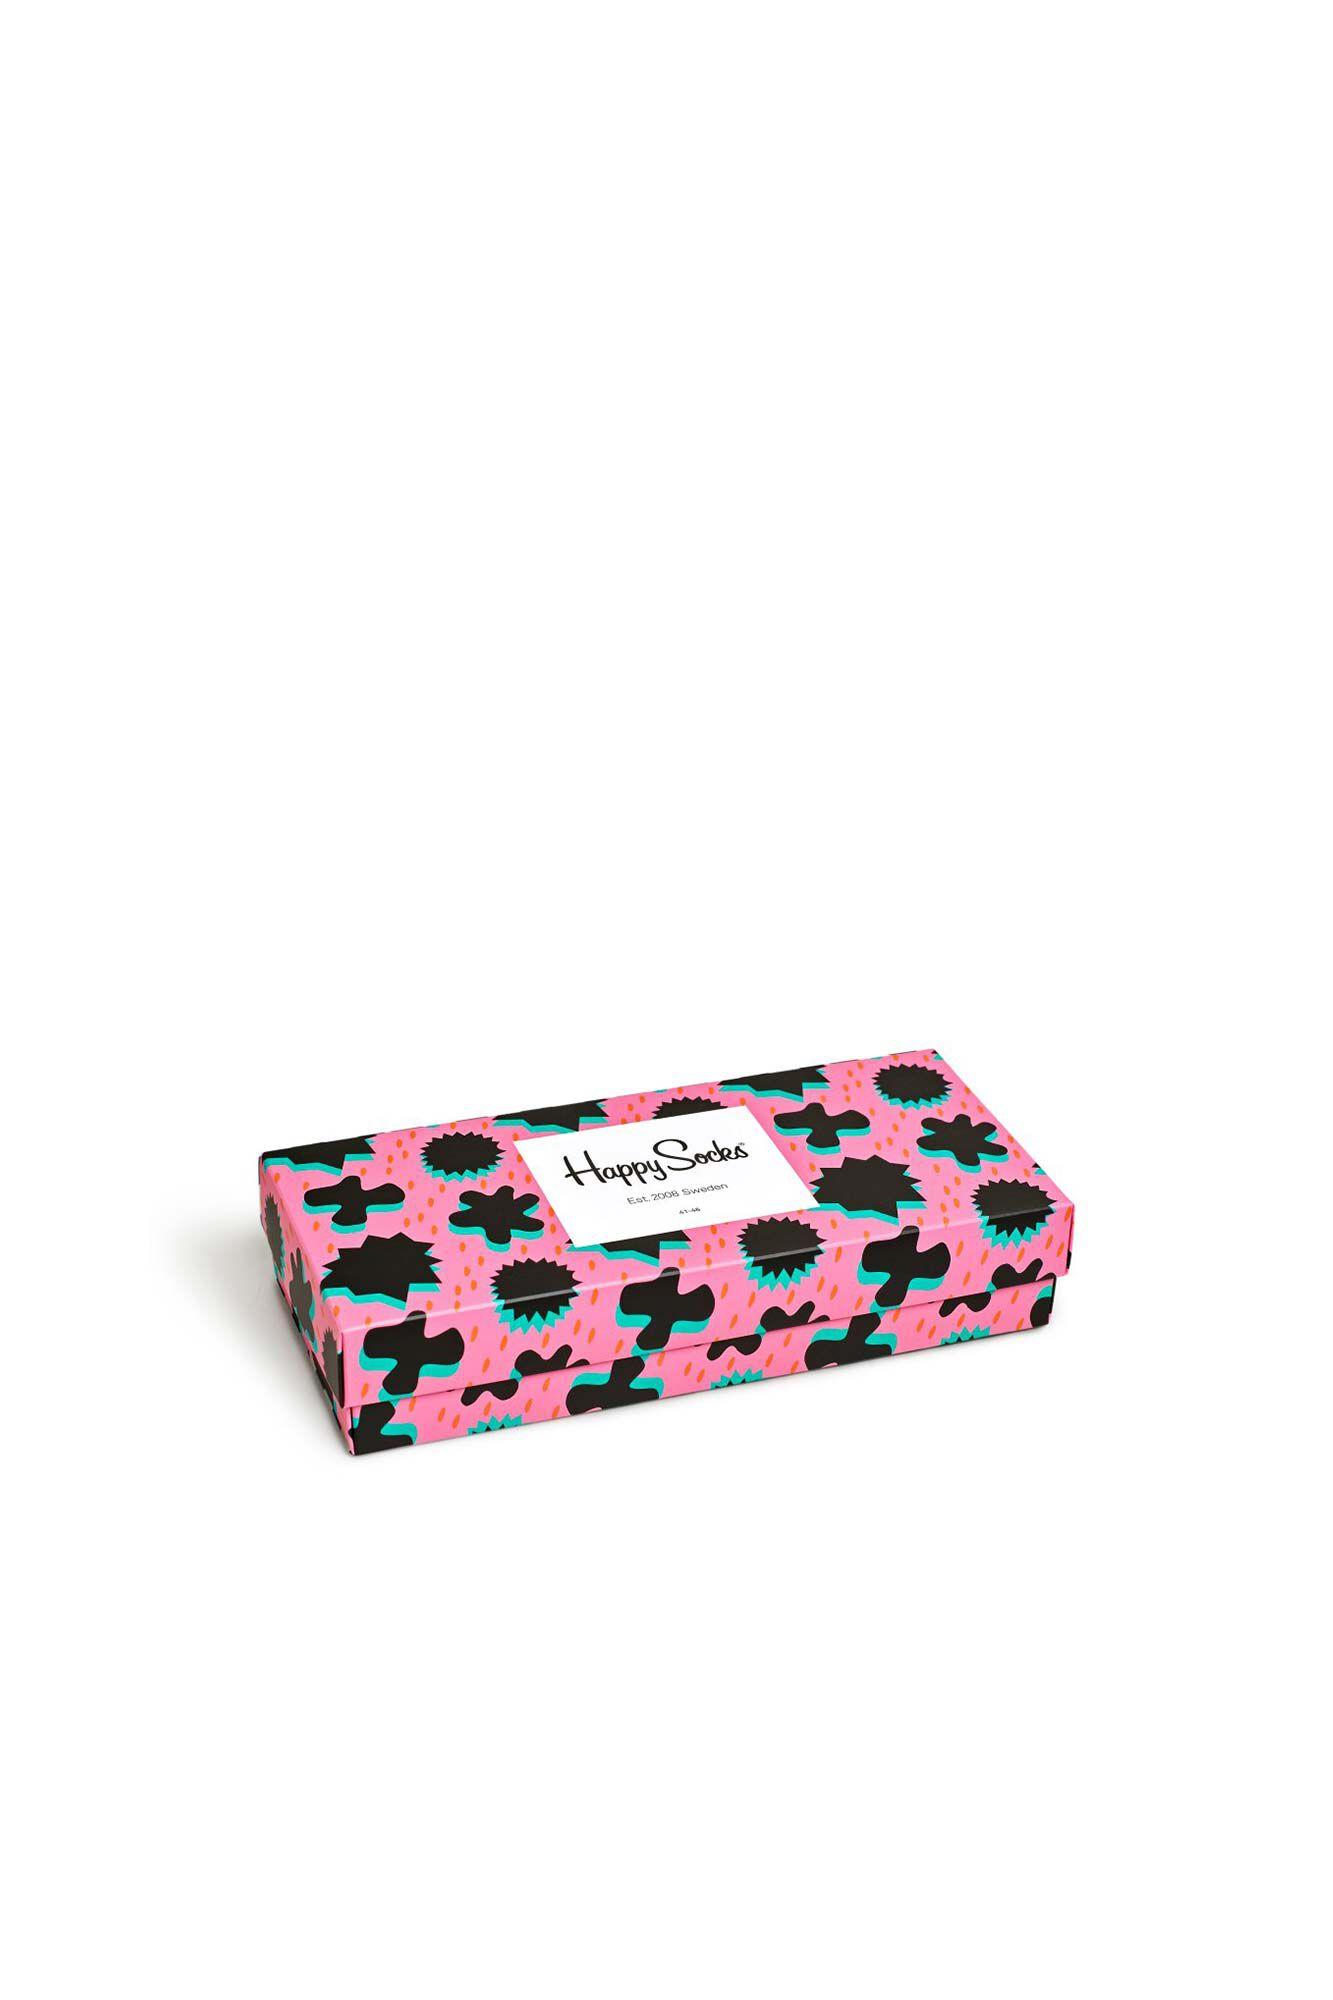 Festival gift box XFST09, 100